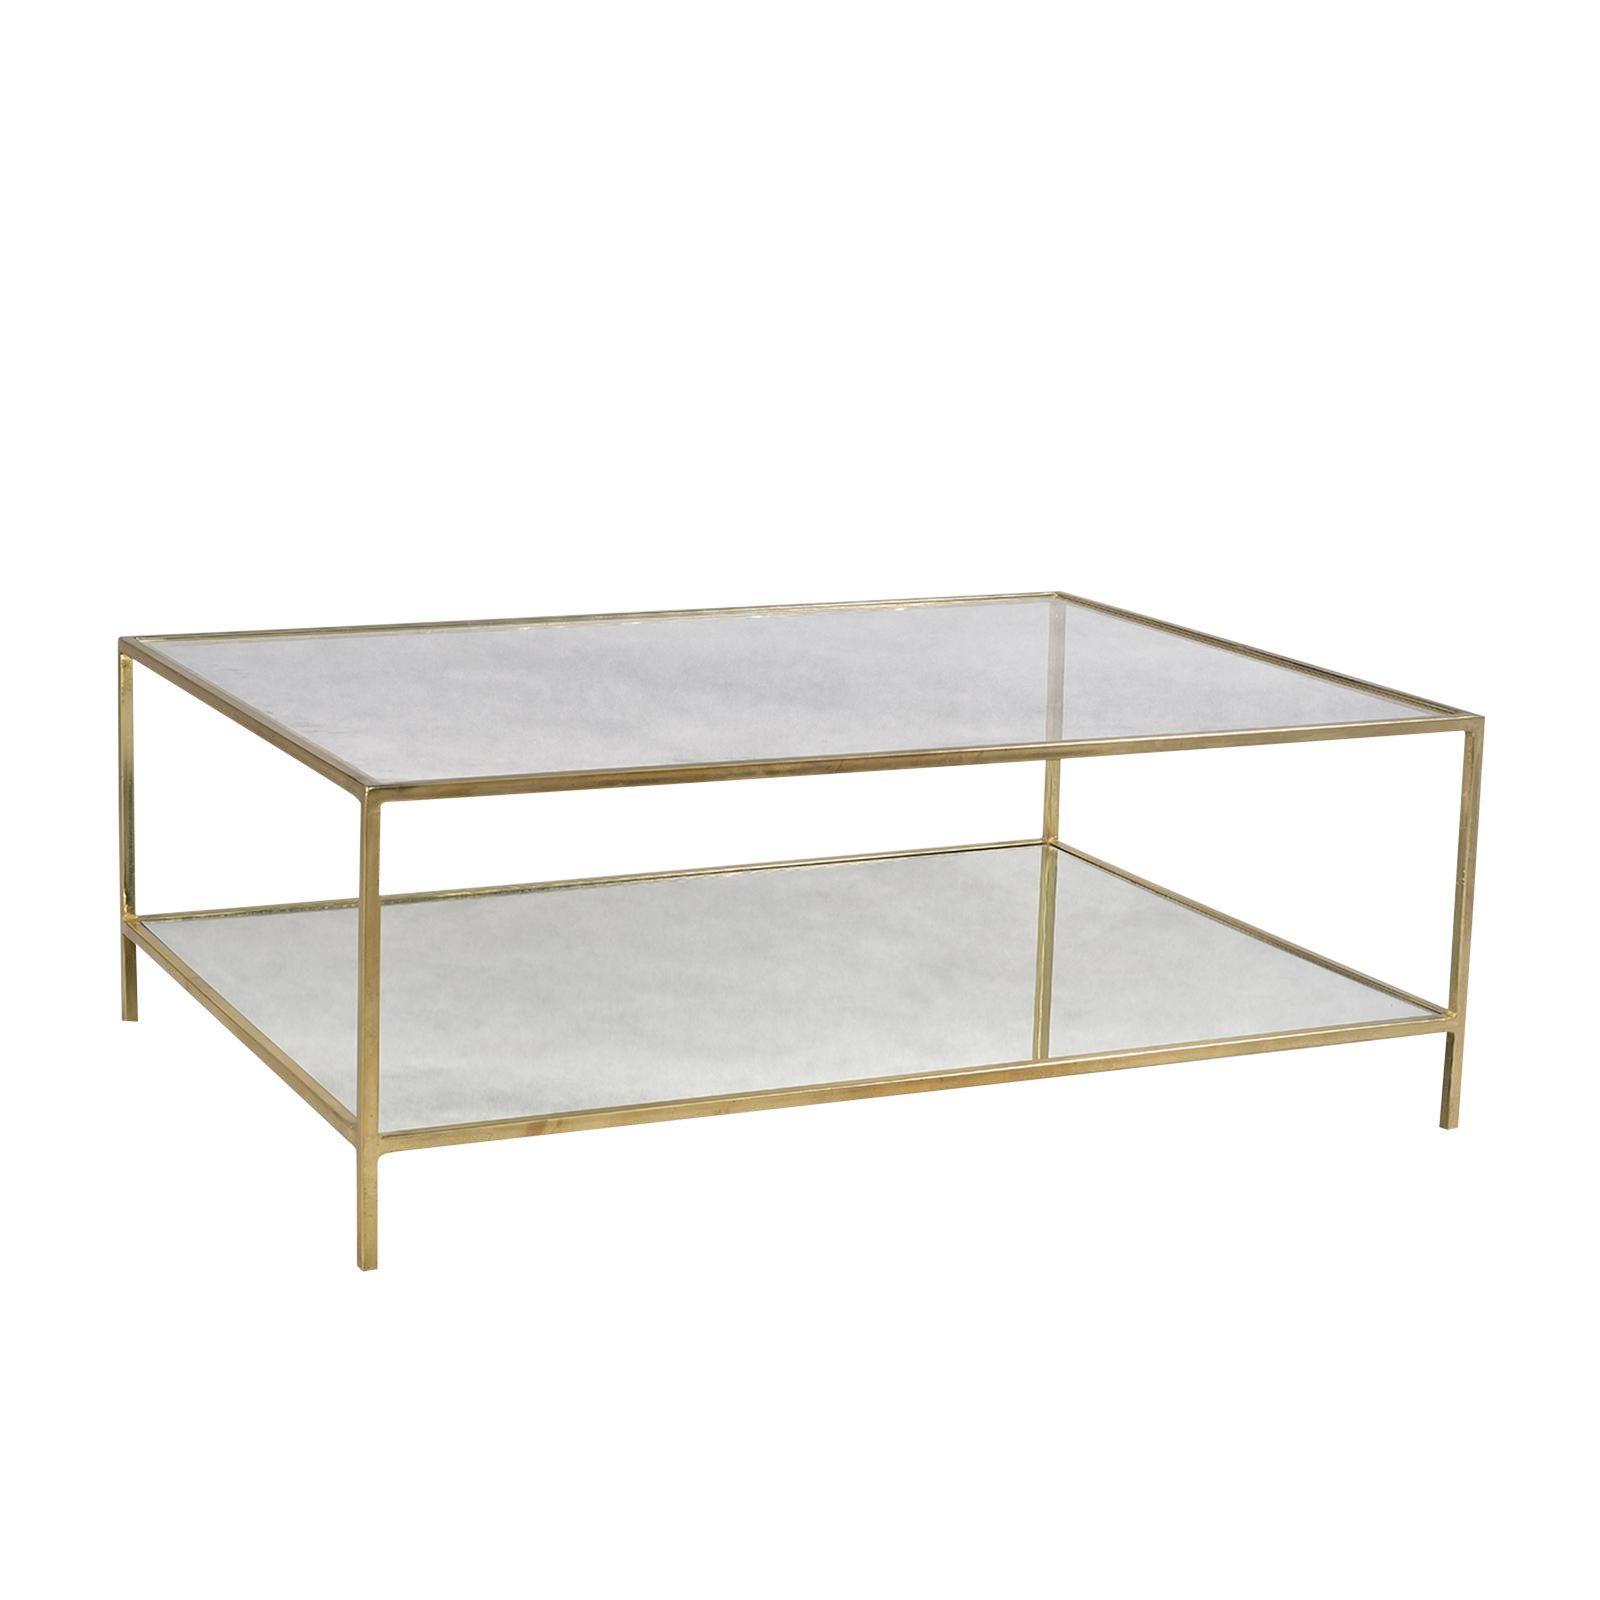 Brass Glass Coffee Table Chairish Mirrored Coffee Tables Coffee Table Glass Coffee Table [ 1600 x 1600 Pixel ]